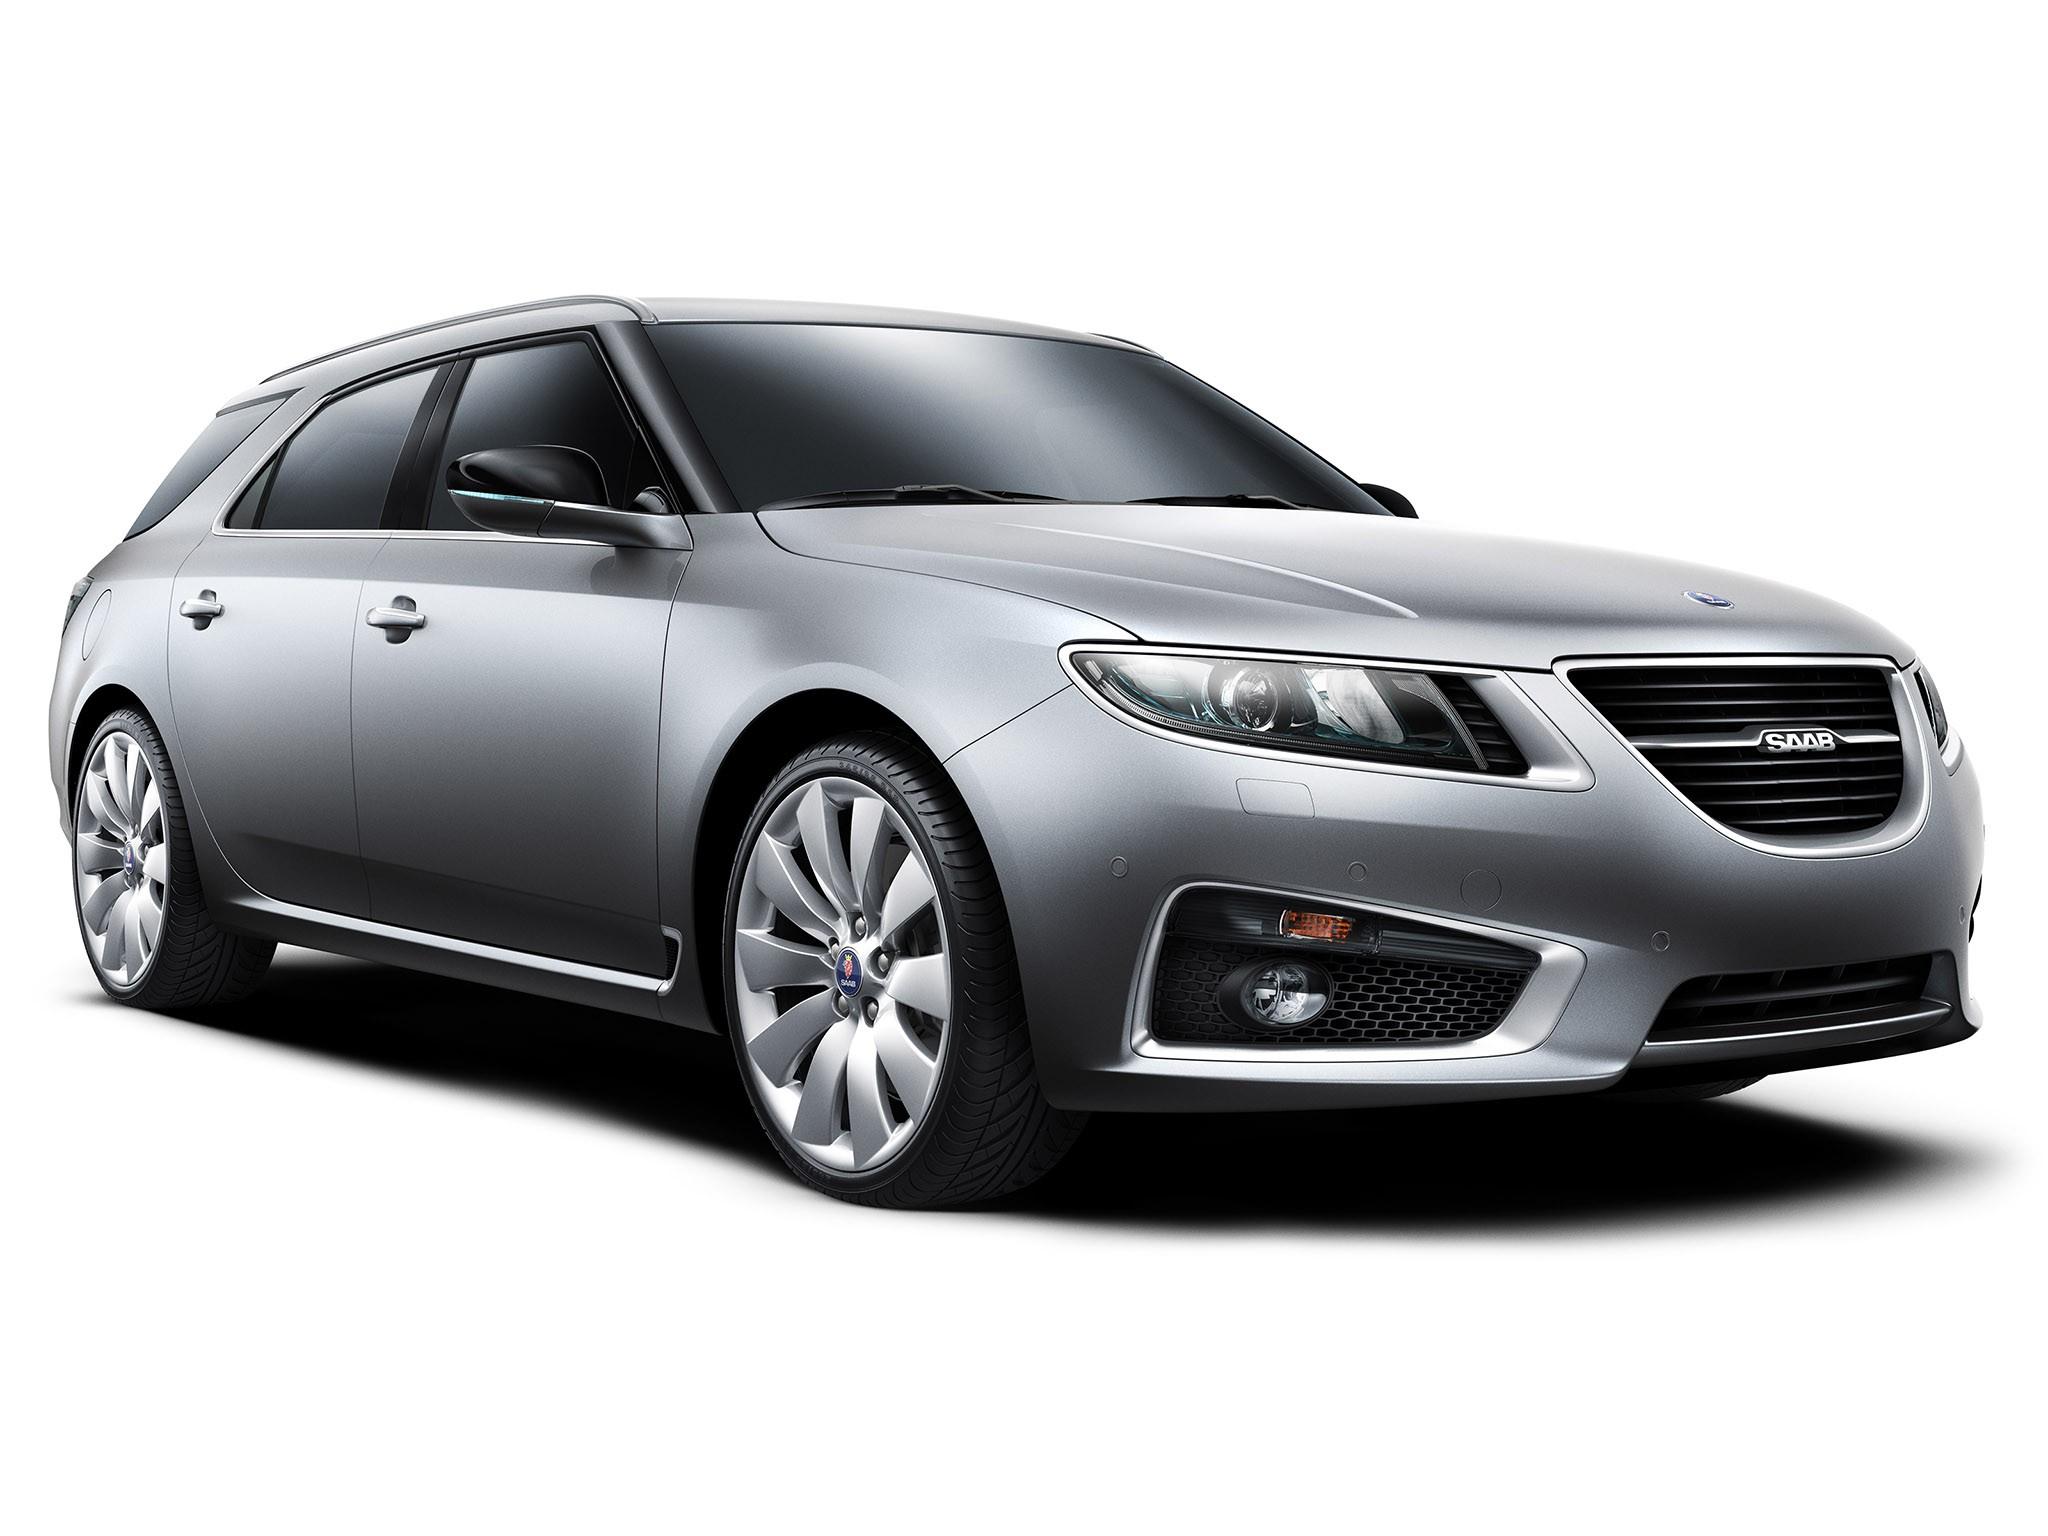 2011 Saab 9-5 Sport Combi